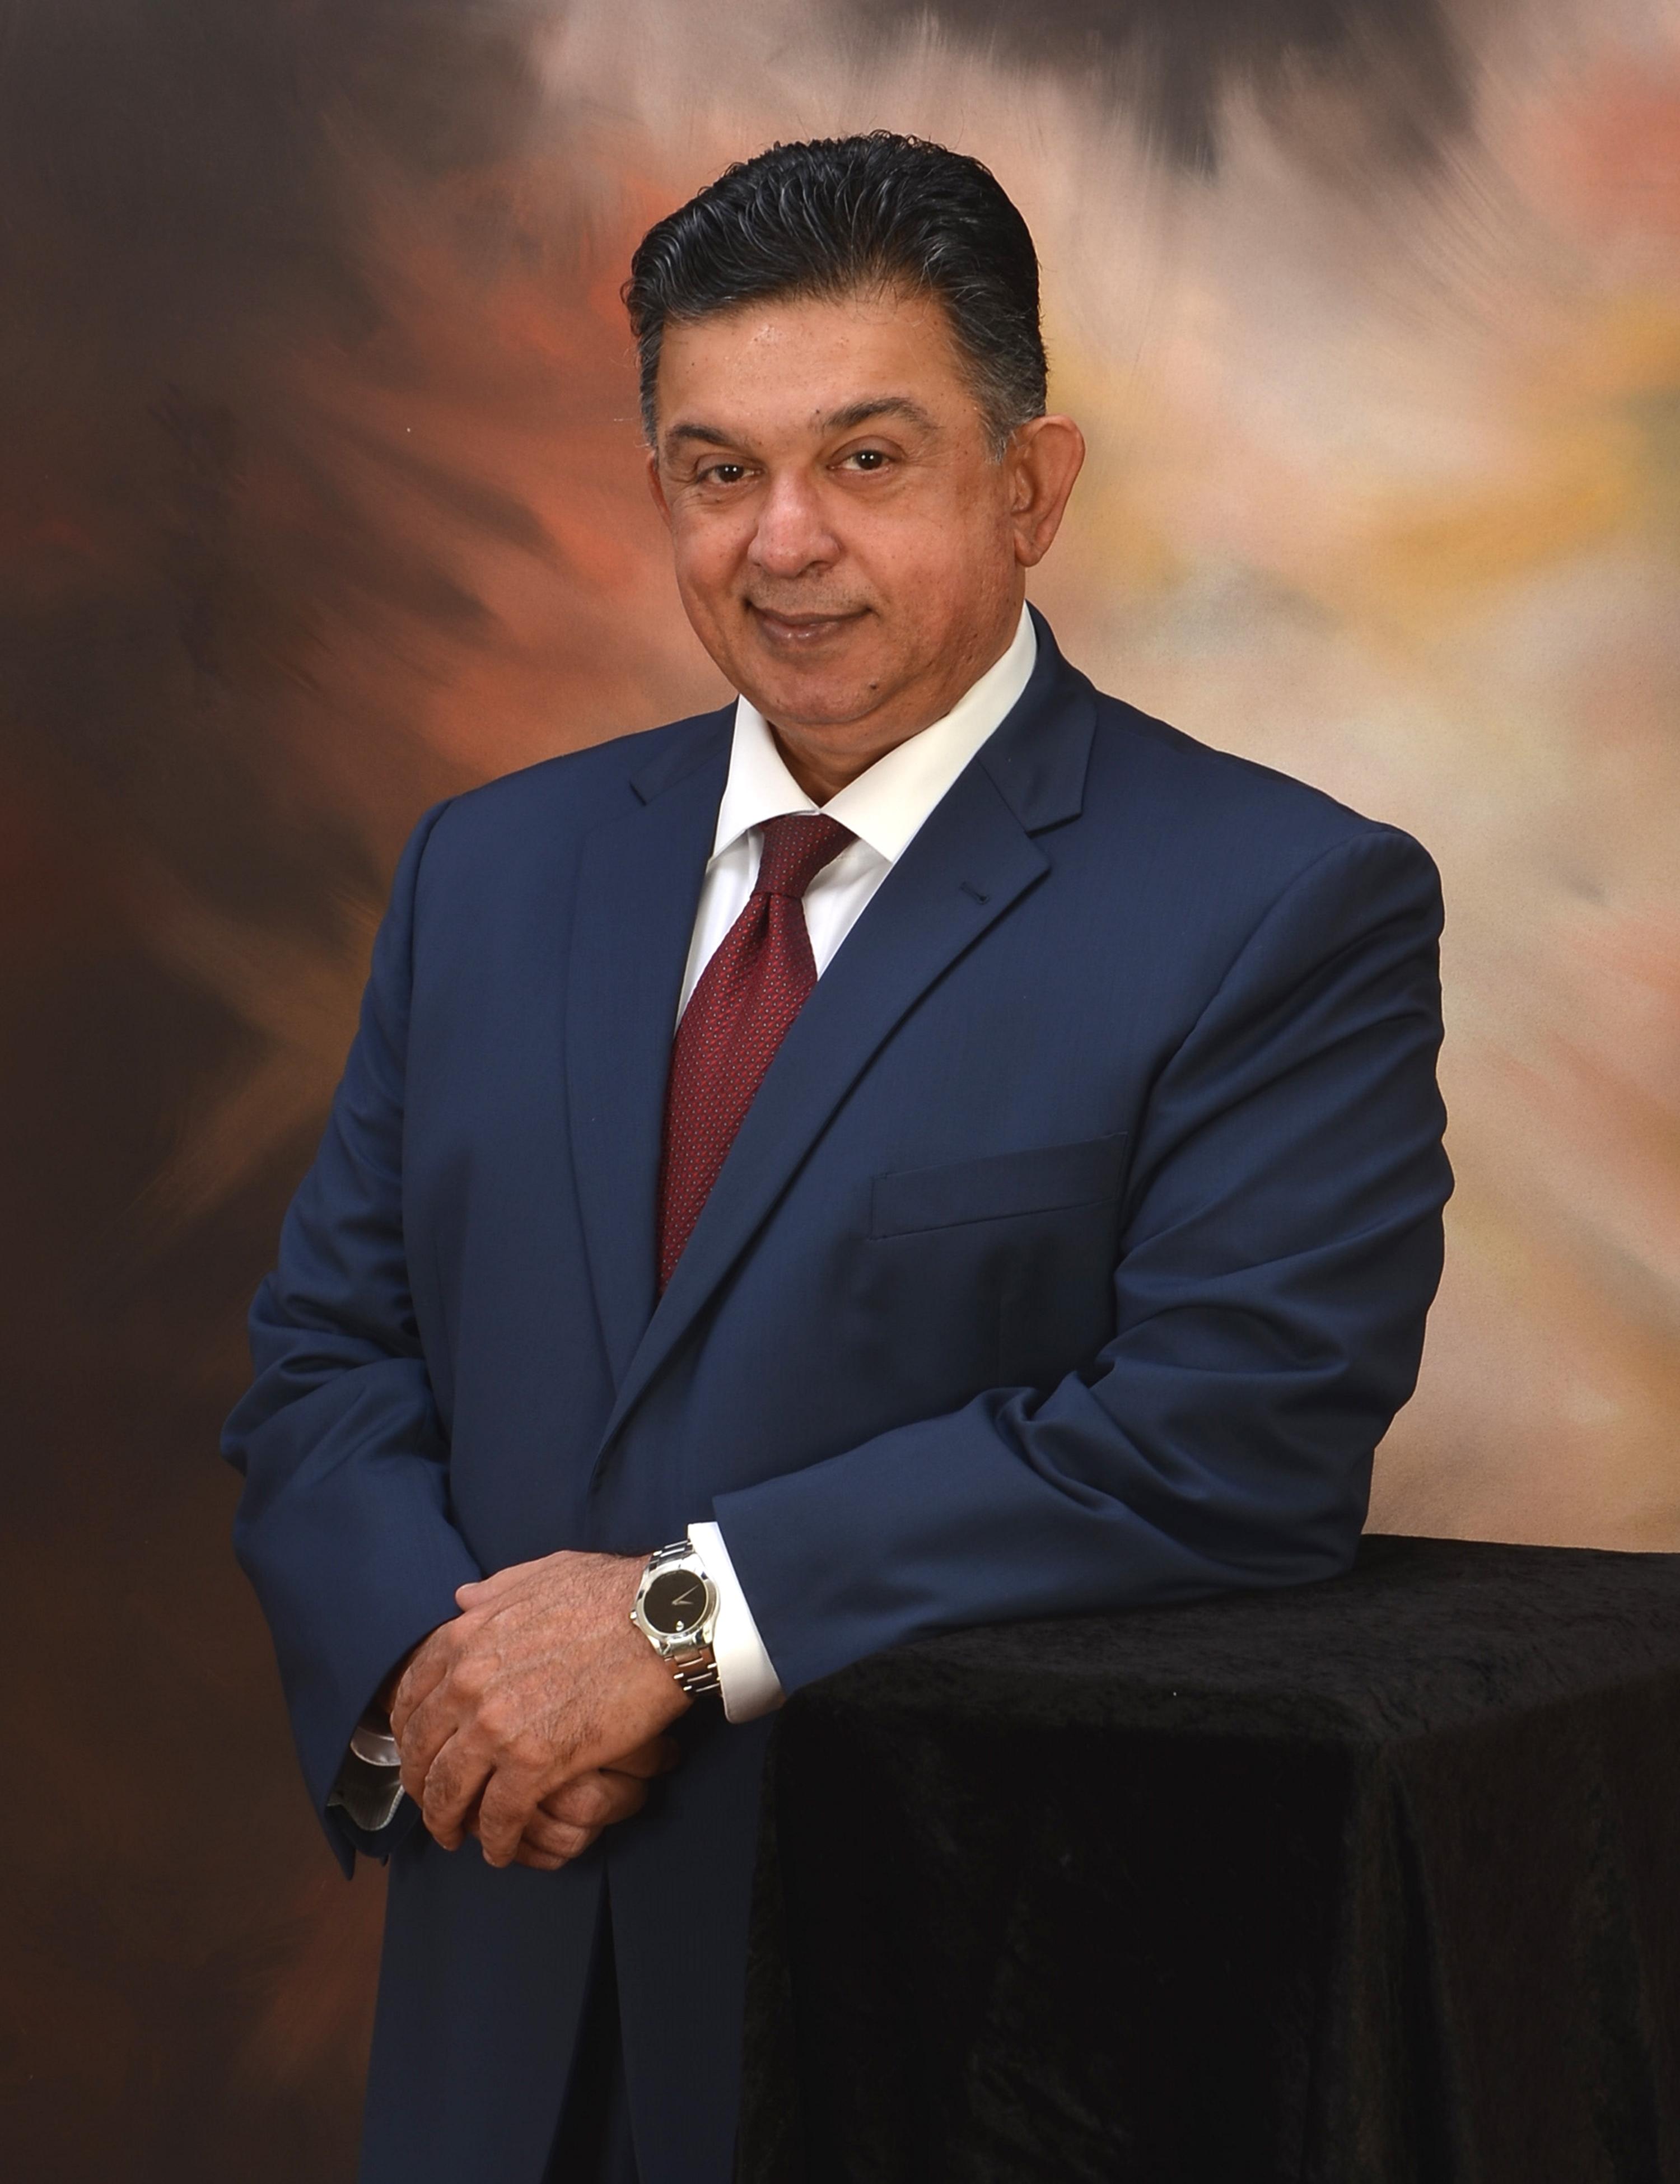 Arif Ali Amirali